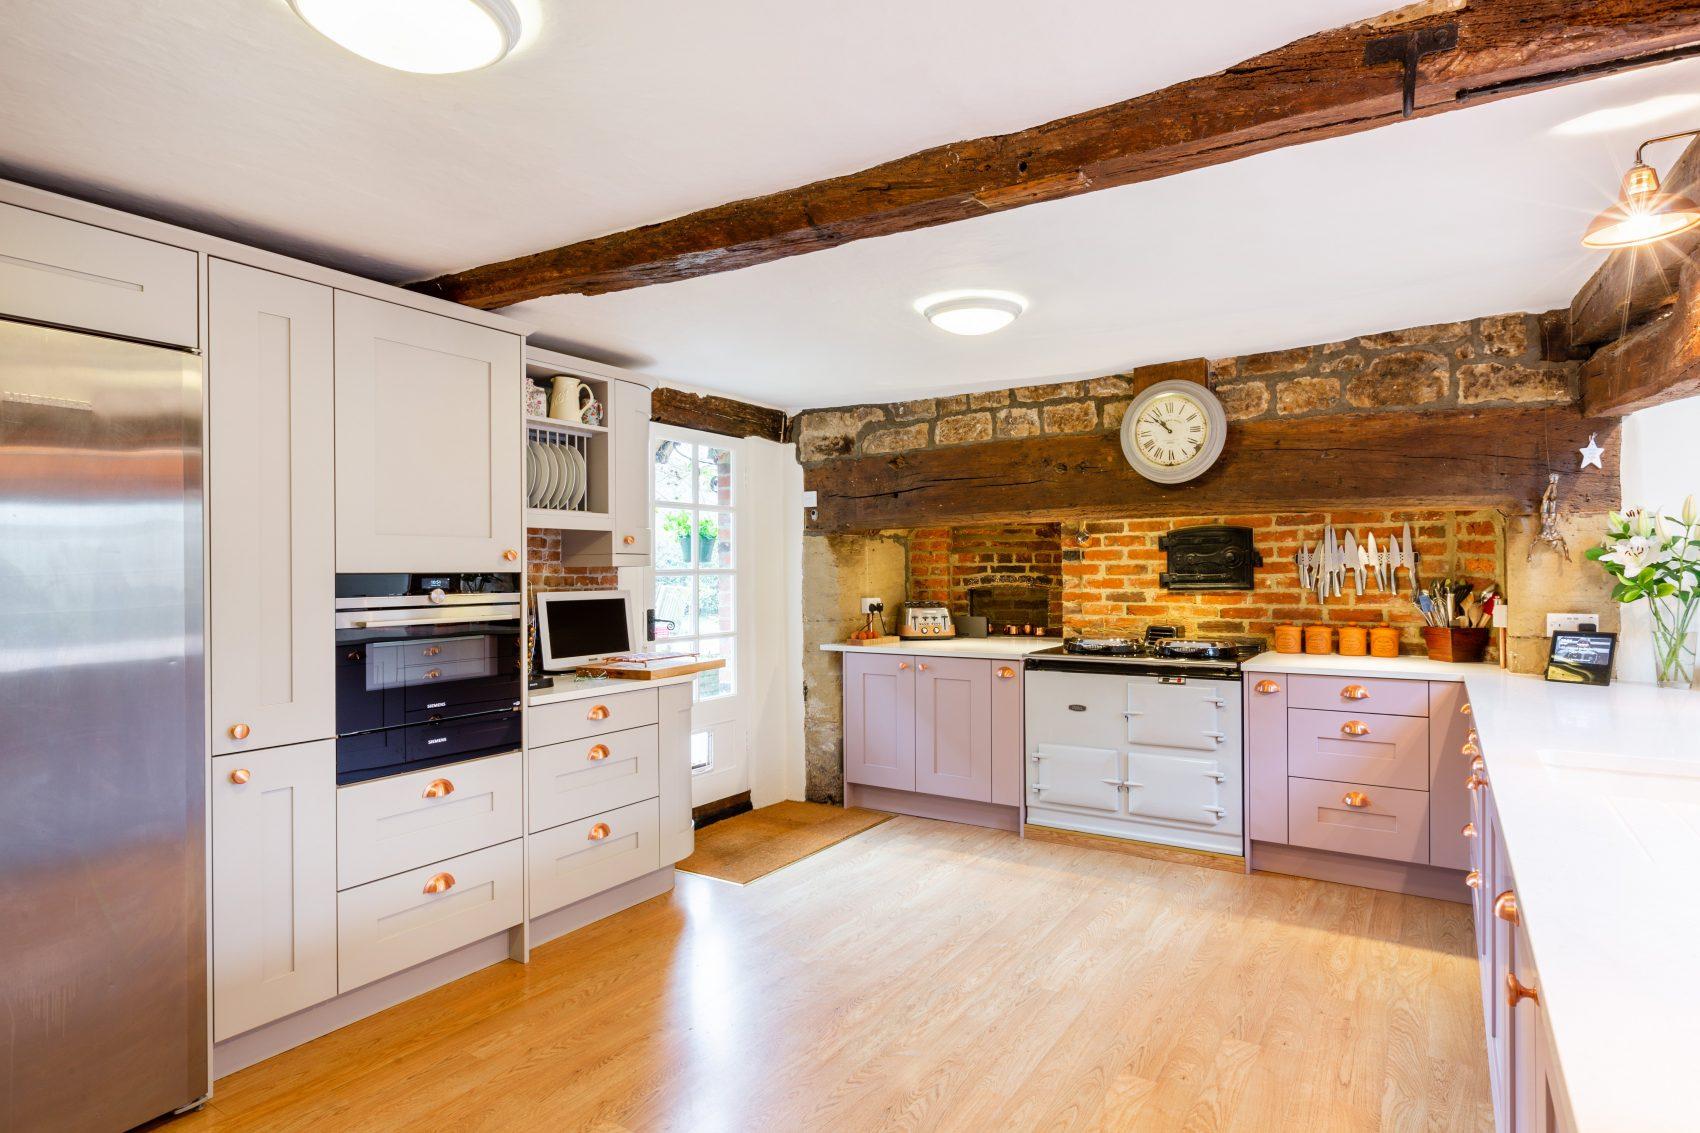 Big Kitchen Design - Period home - Kitchens Bespoke